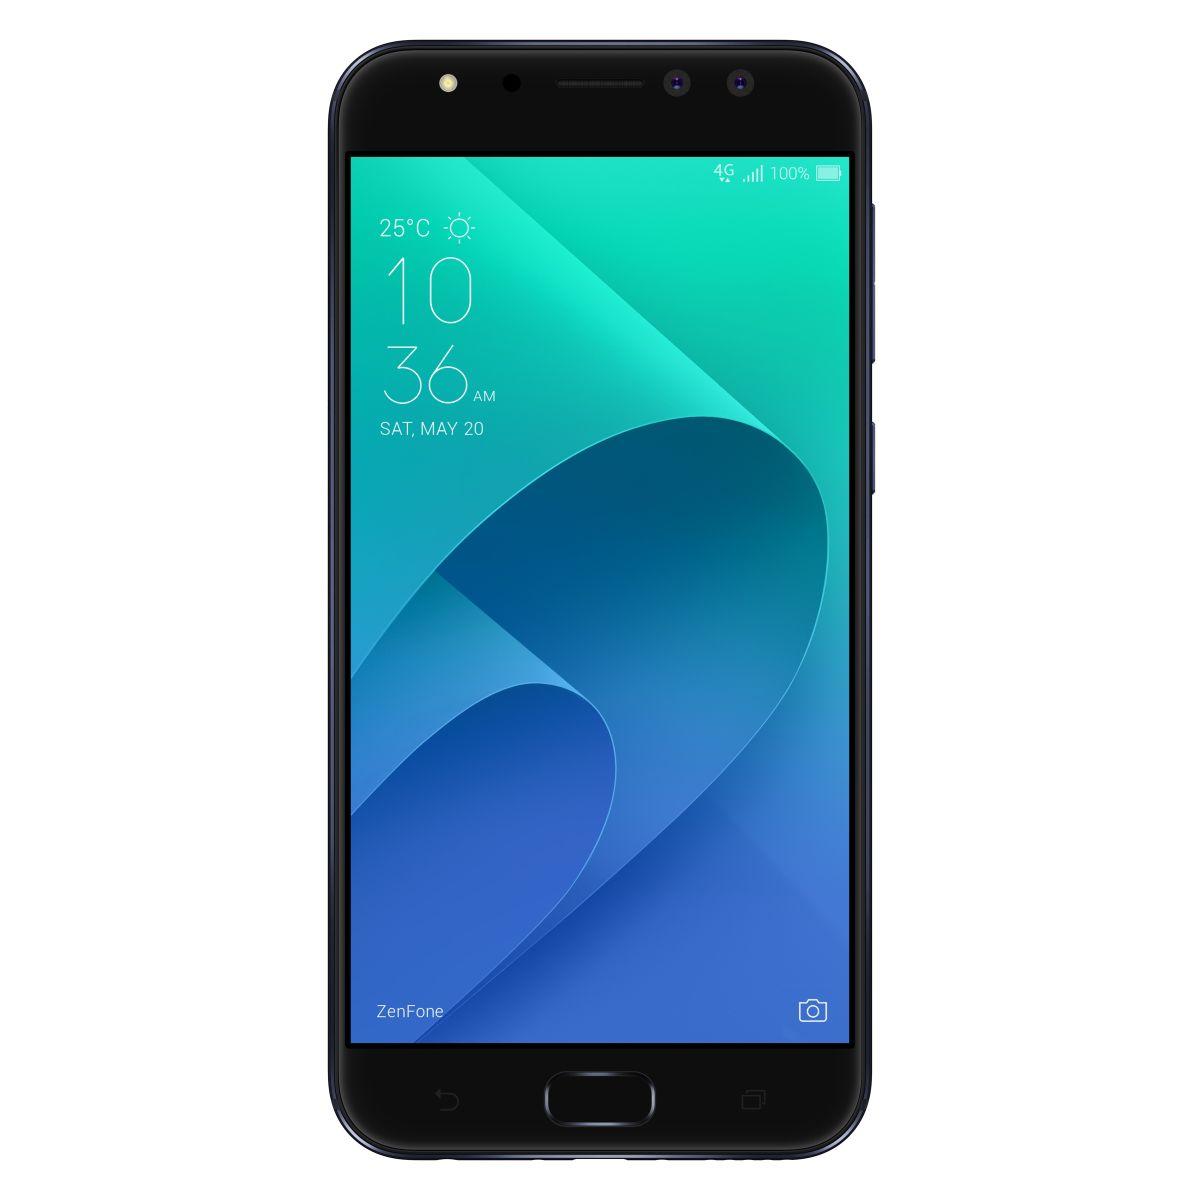 Asus Zenfone 4 Selfie Pro ZD552KL Dual SIM, Octa Core 2.0GHz, 64GB + 4GB RAM, LTE, Deepsea Black